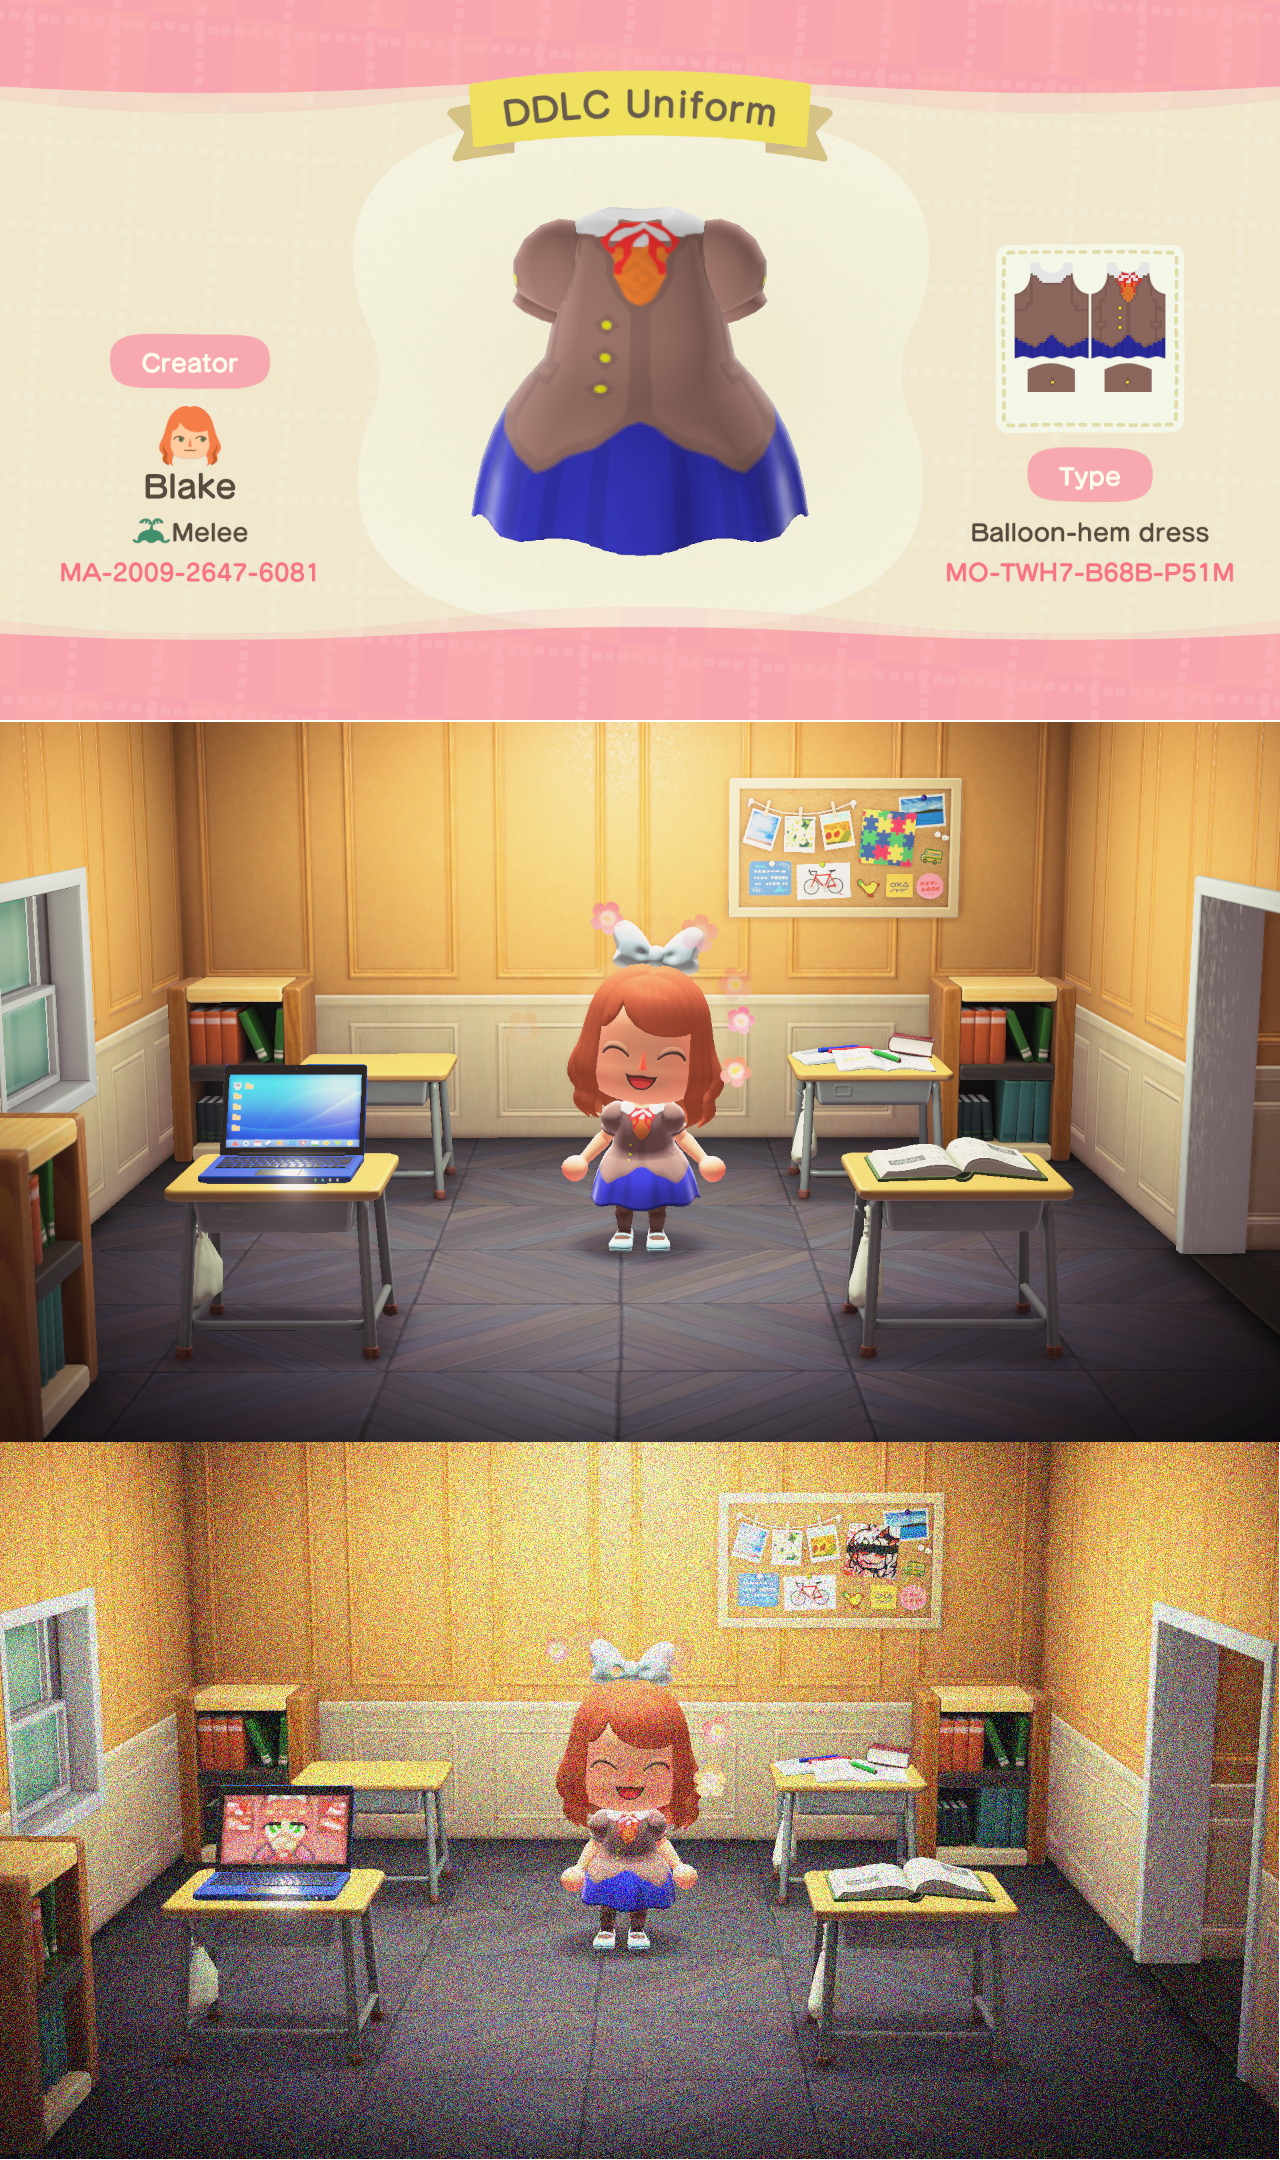 I made Monika's uniform from DDLC!